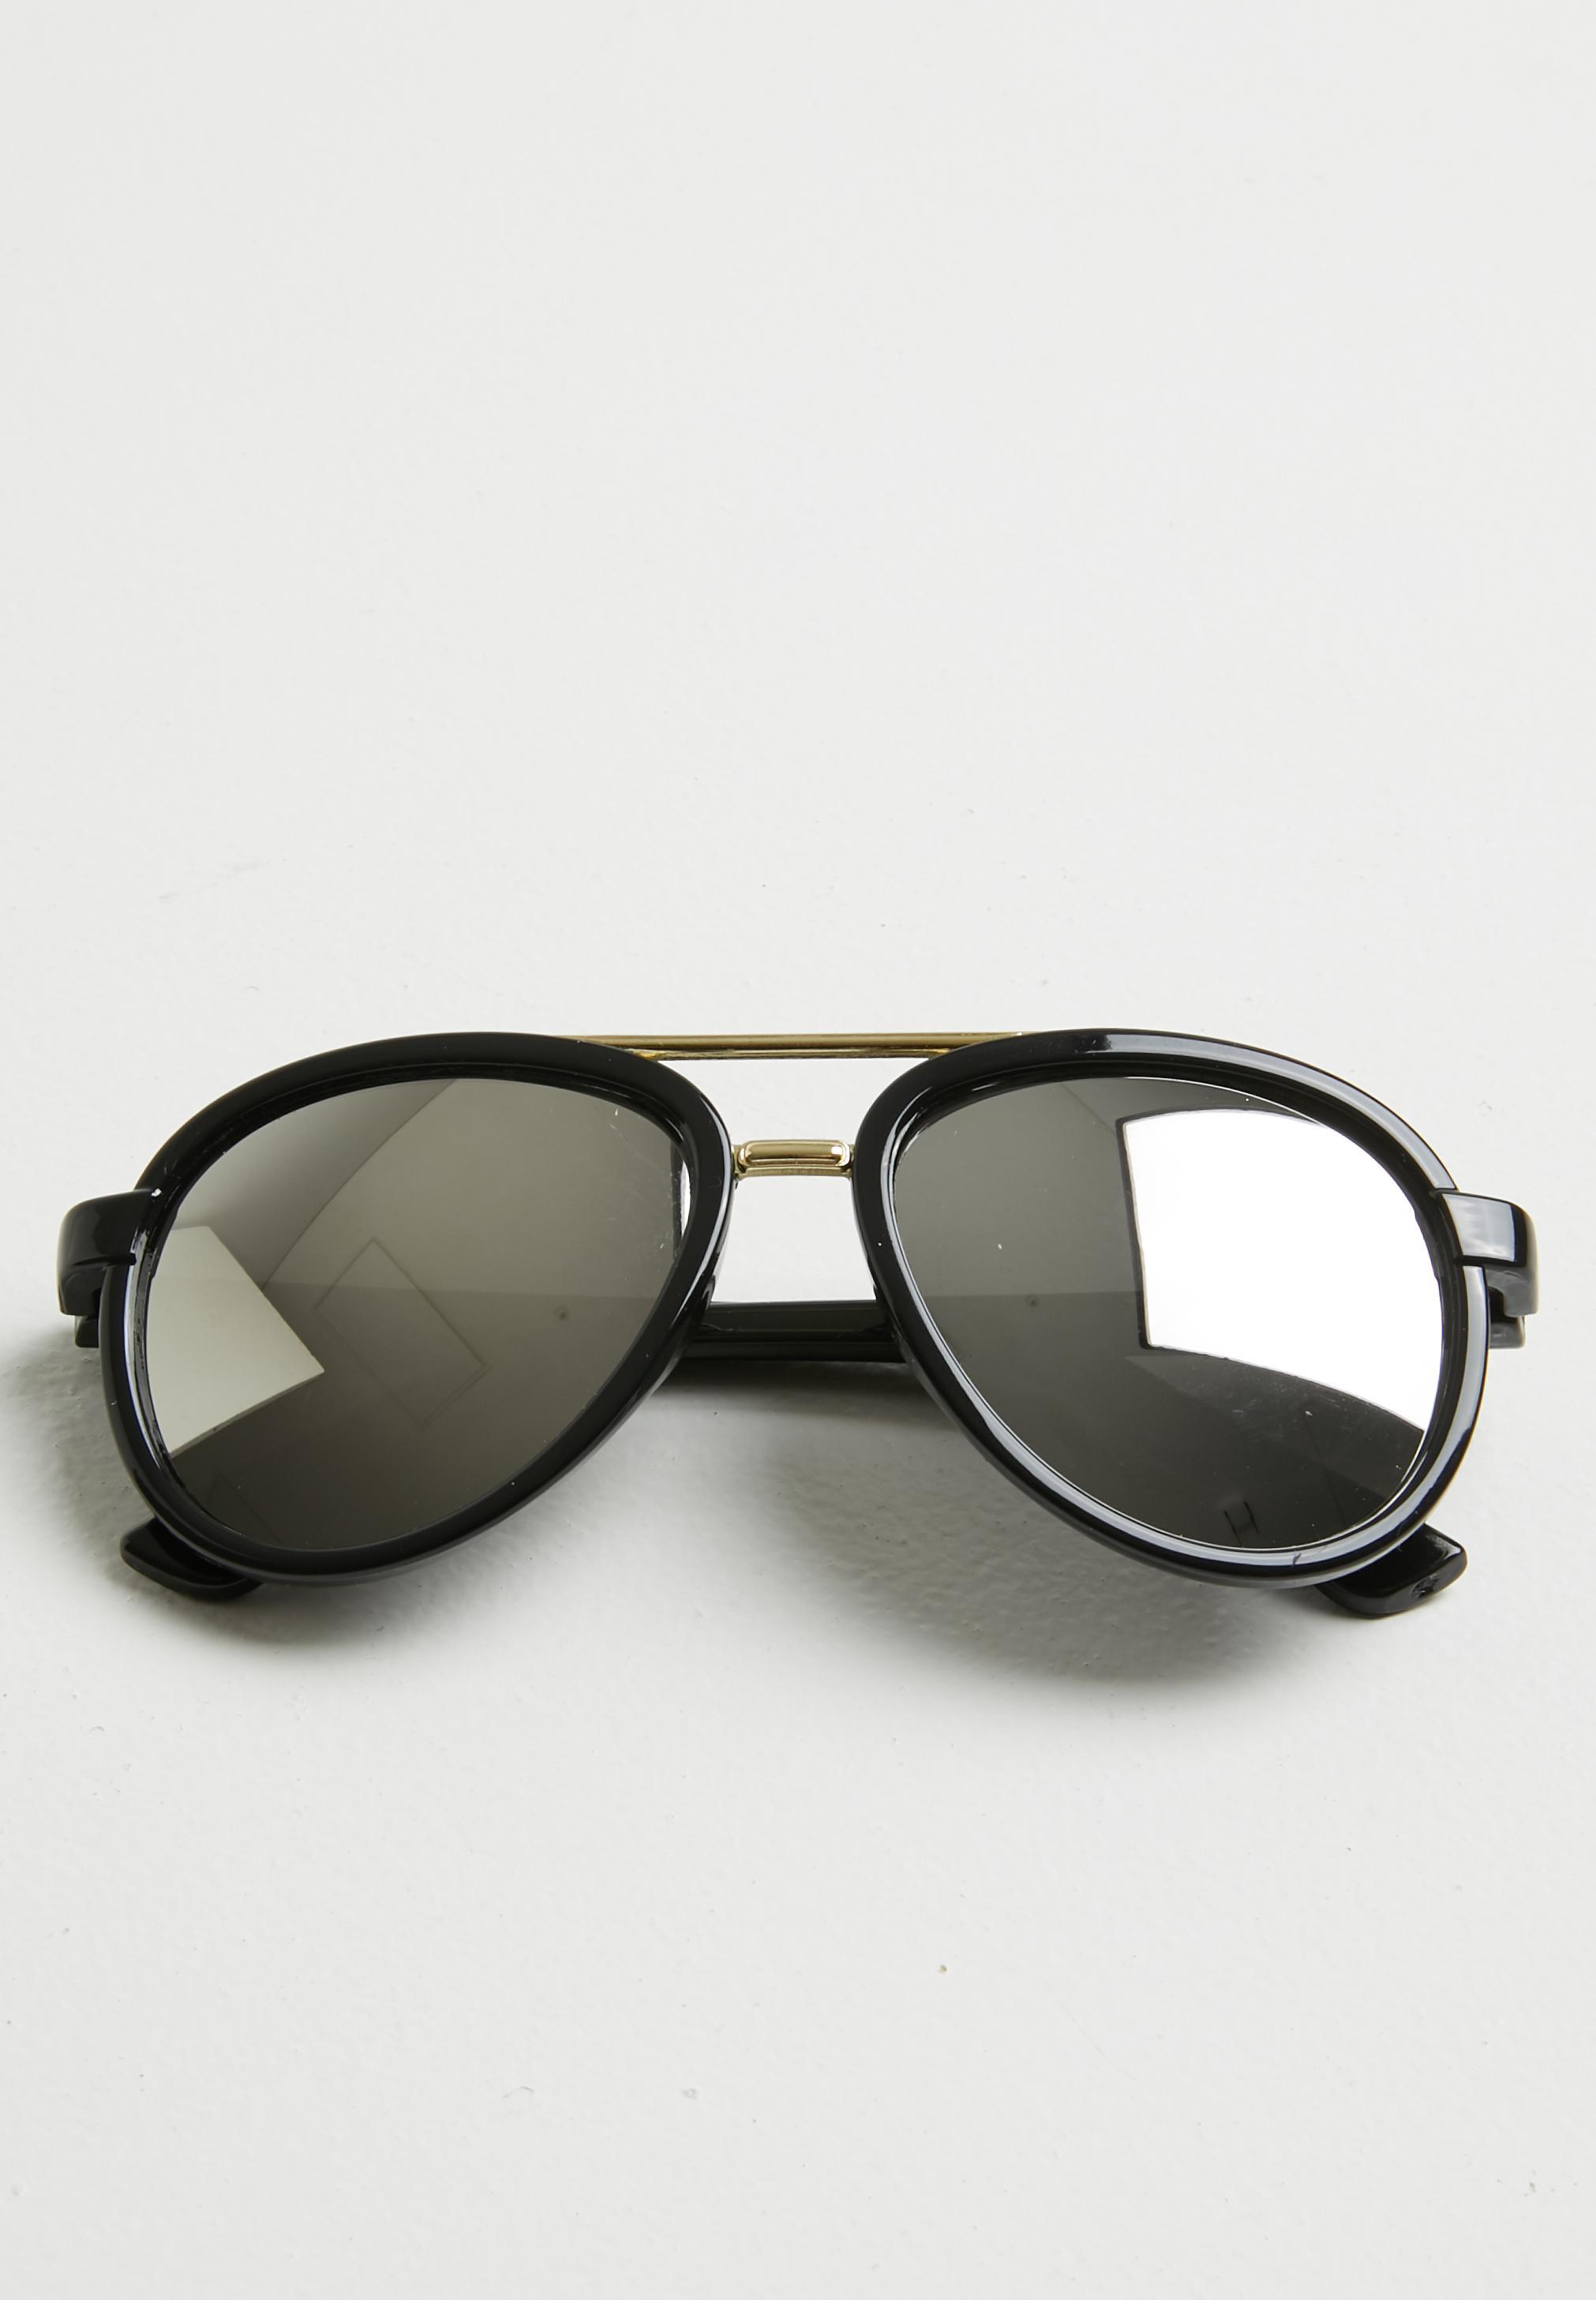 83d31117ea Reebok Mens Aviator Sunglasses